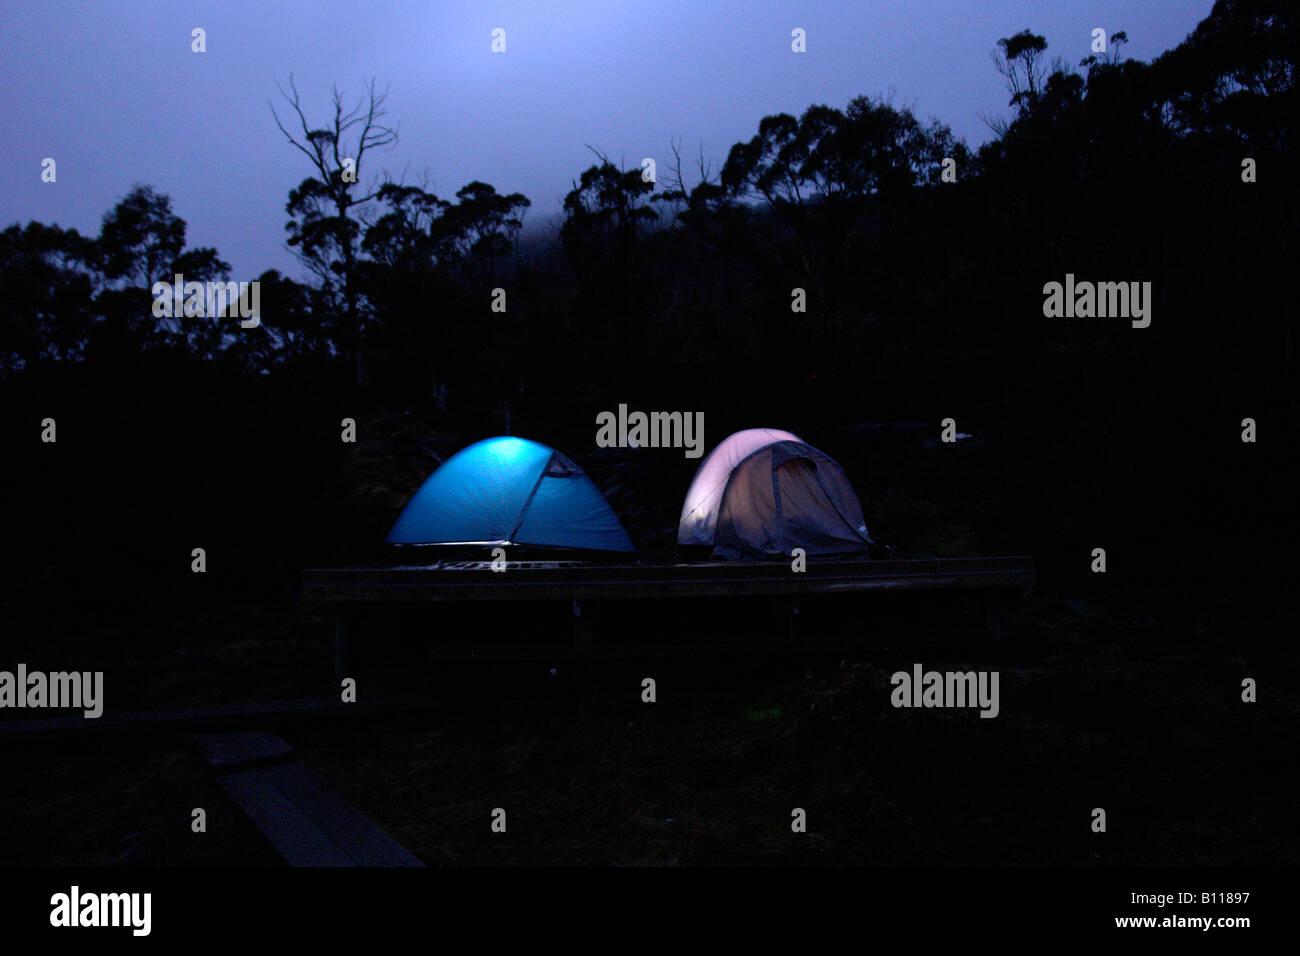 tentcamp at Cradle Mountain National Park Cradle Mountain Tasmania - Stock Image